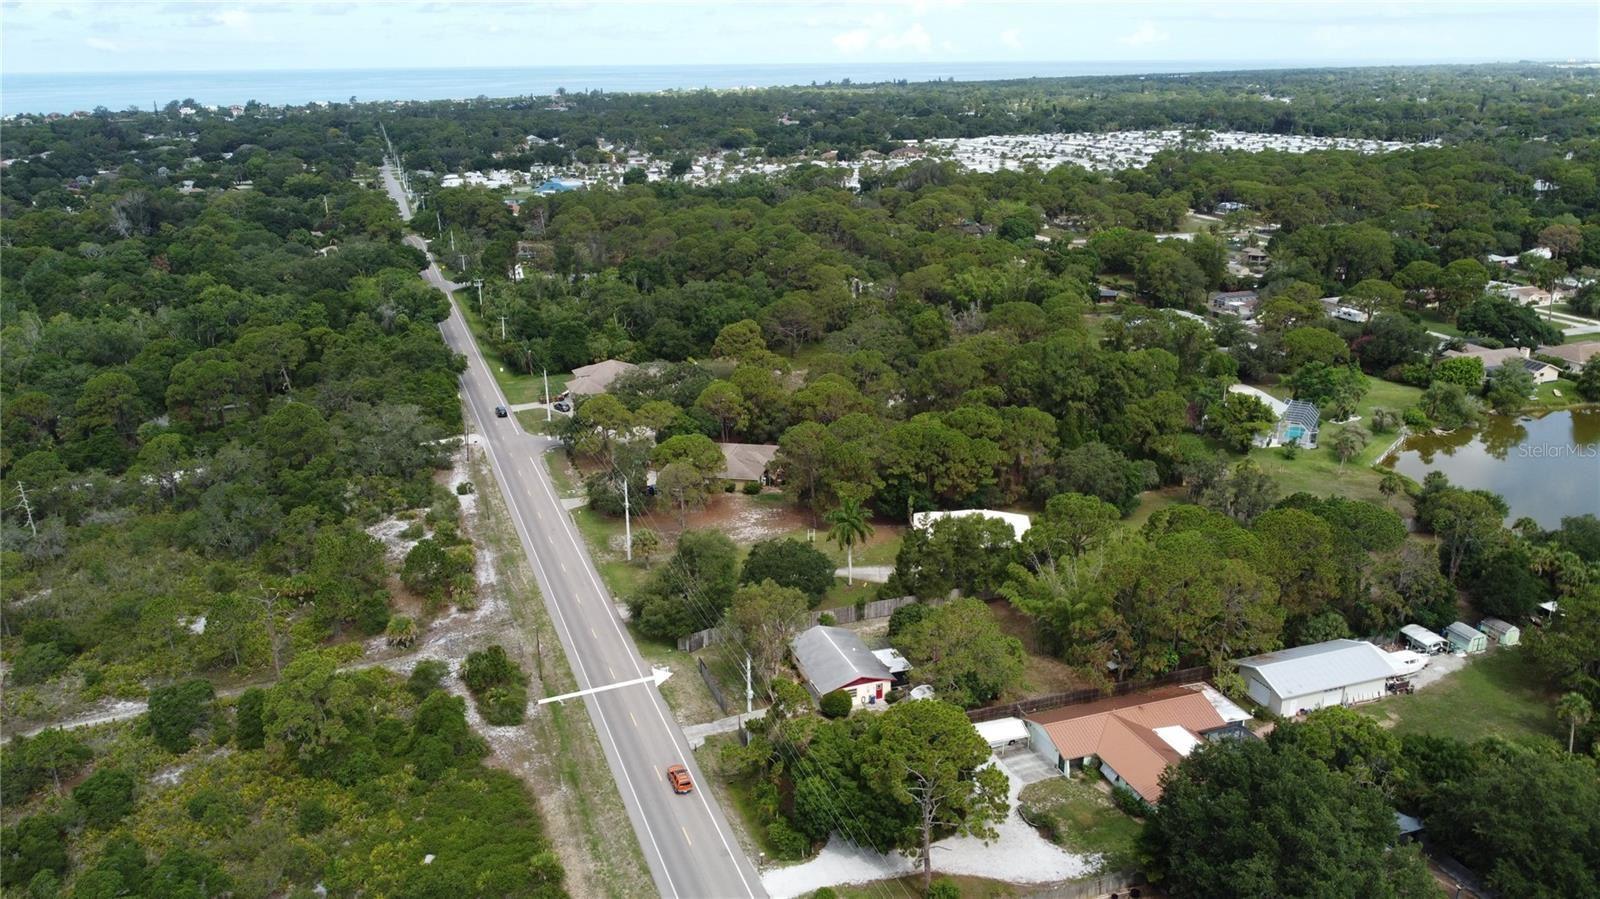 Photo of 1322 MANASOTA BEACH ROAD, ENGLEWOOD, FL 34223 (MLS # A4504675)